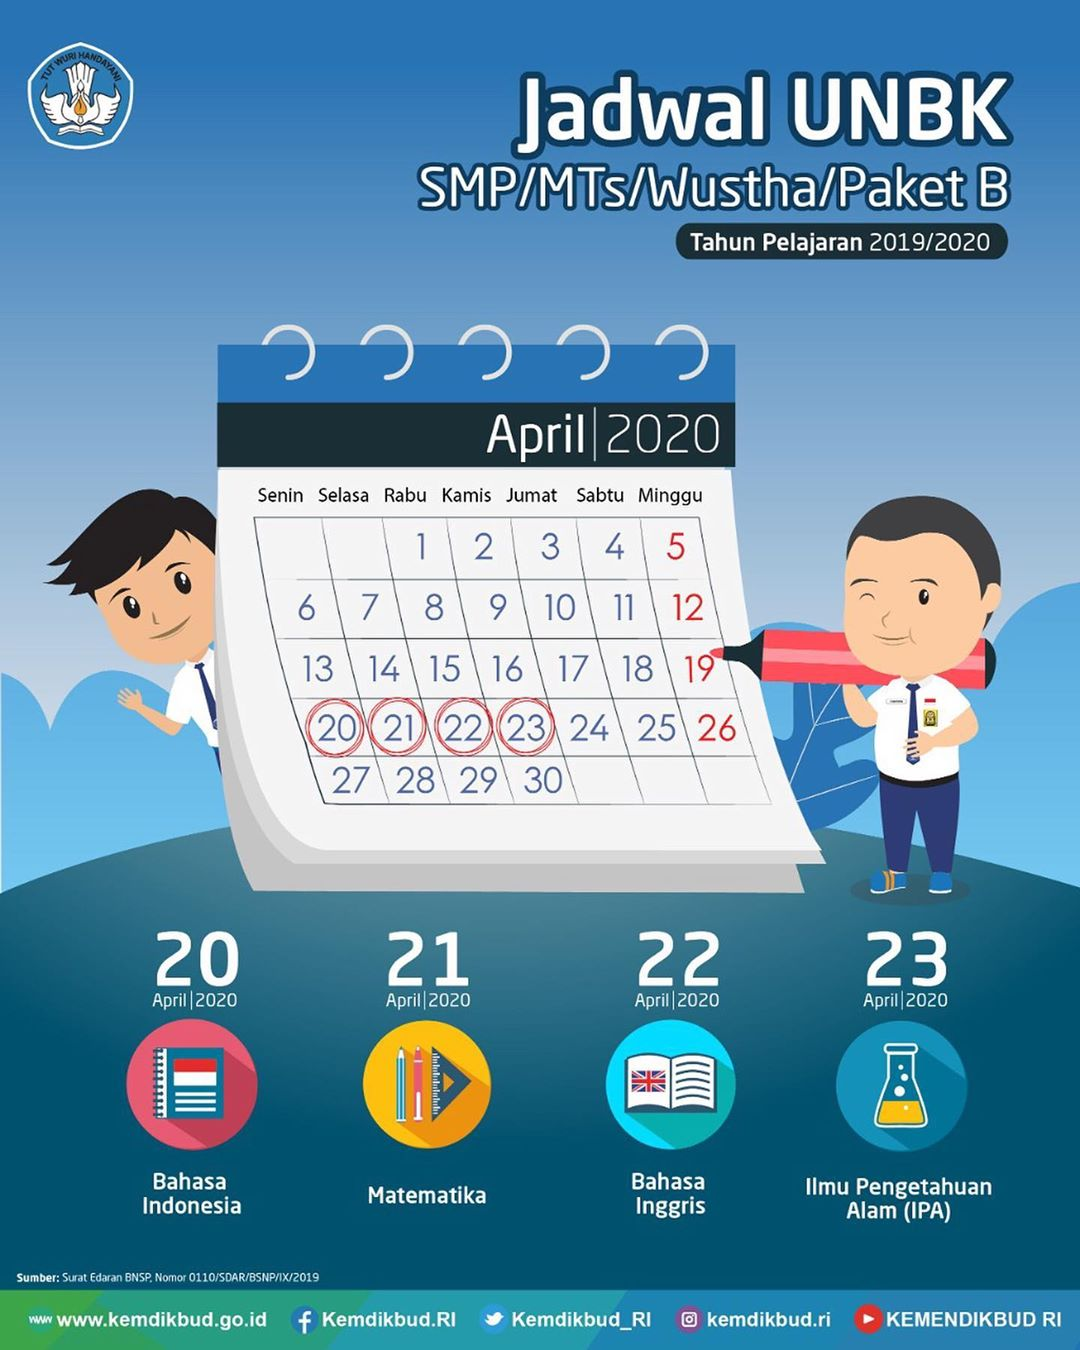 Jadwal UNBK SMP MTs Wustha Paket B Tahun Pelajaran 2019/2020